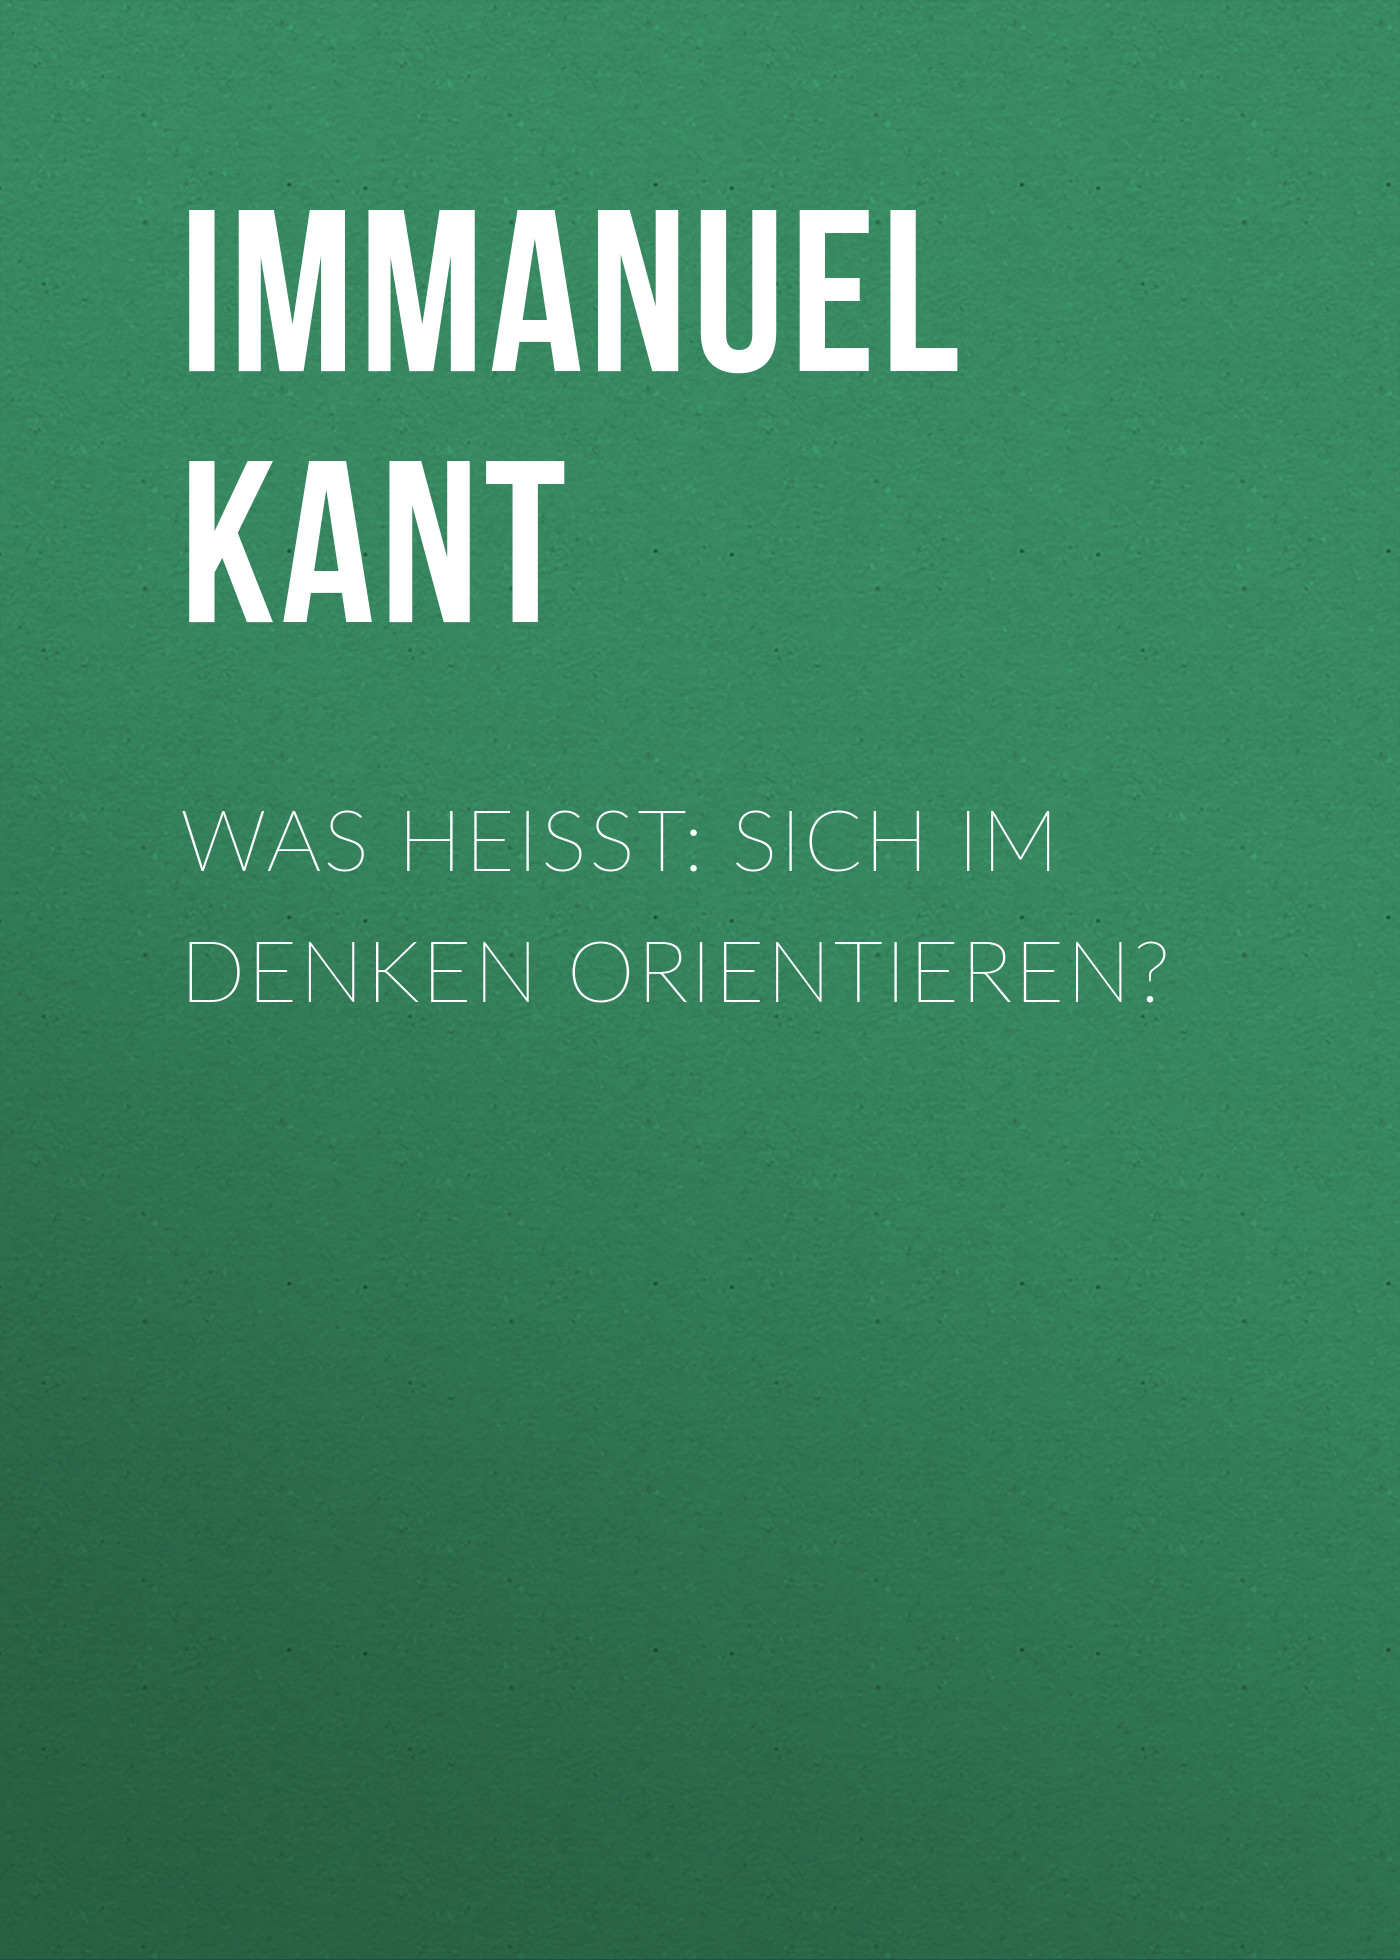 Immanuel Kant Was heißt: sich im Denken orientieren? immanuel kant thomas kingsmill abbott critique of practical reason